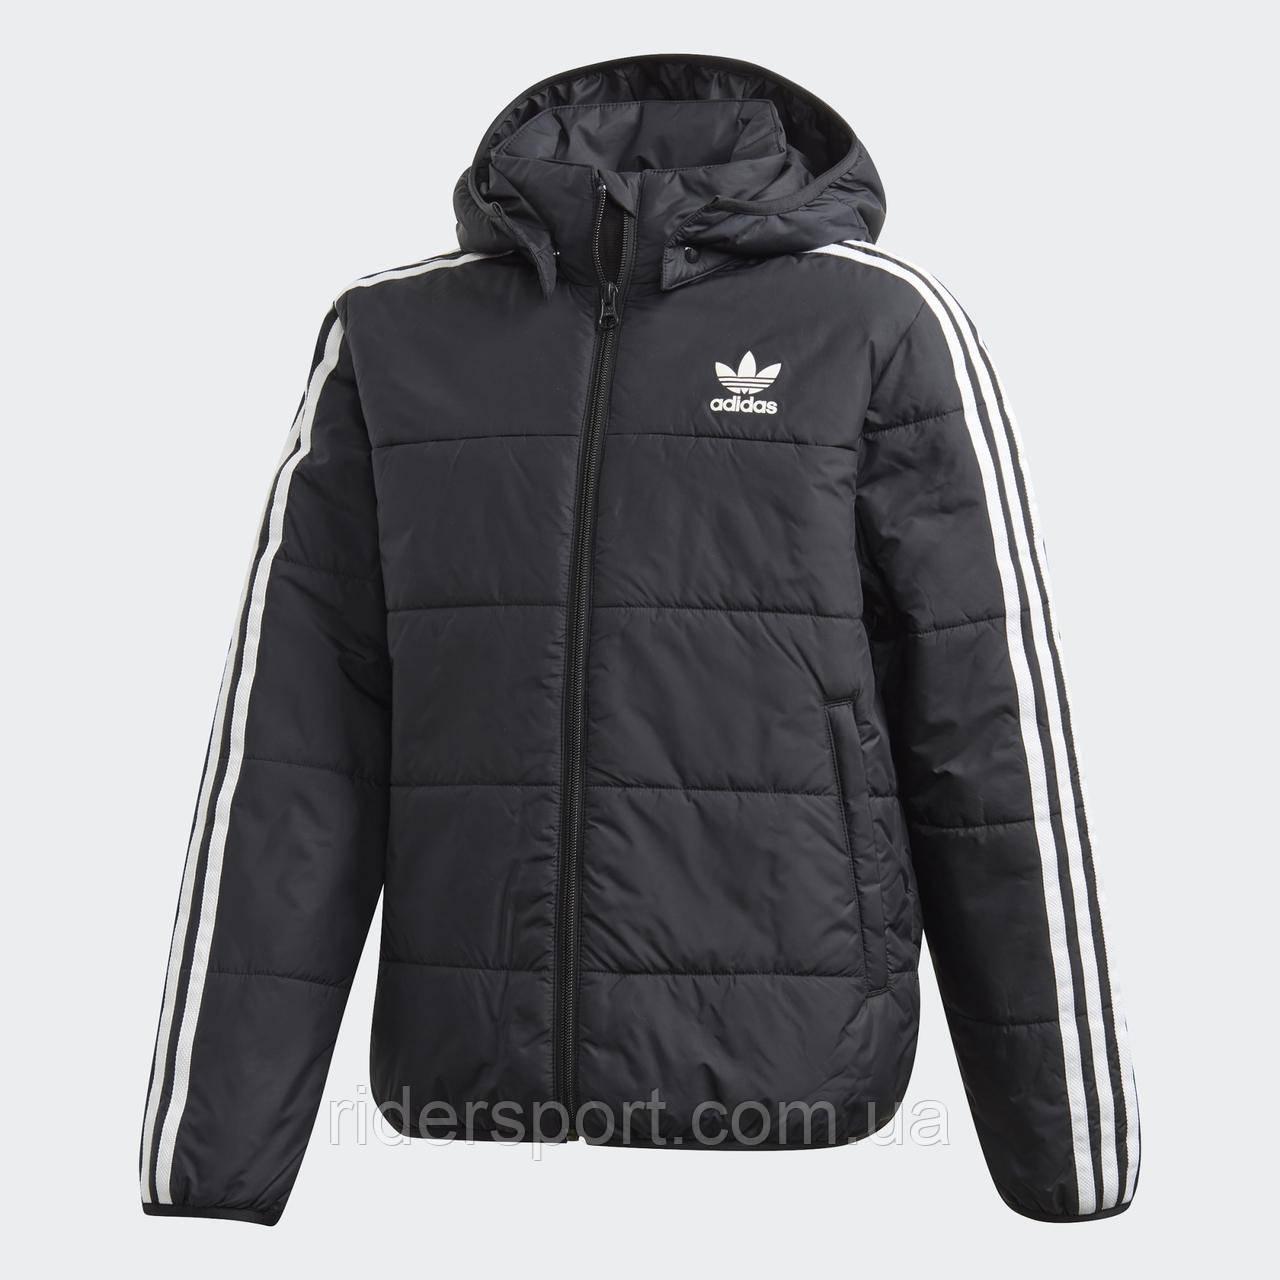 Подростковая курточка КУРТКА ADIDAS 3-STRIPES INSULATED